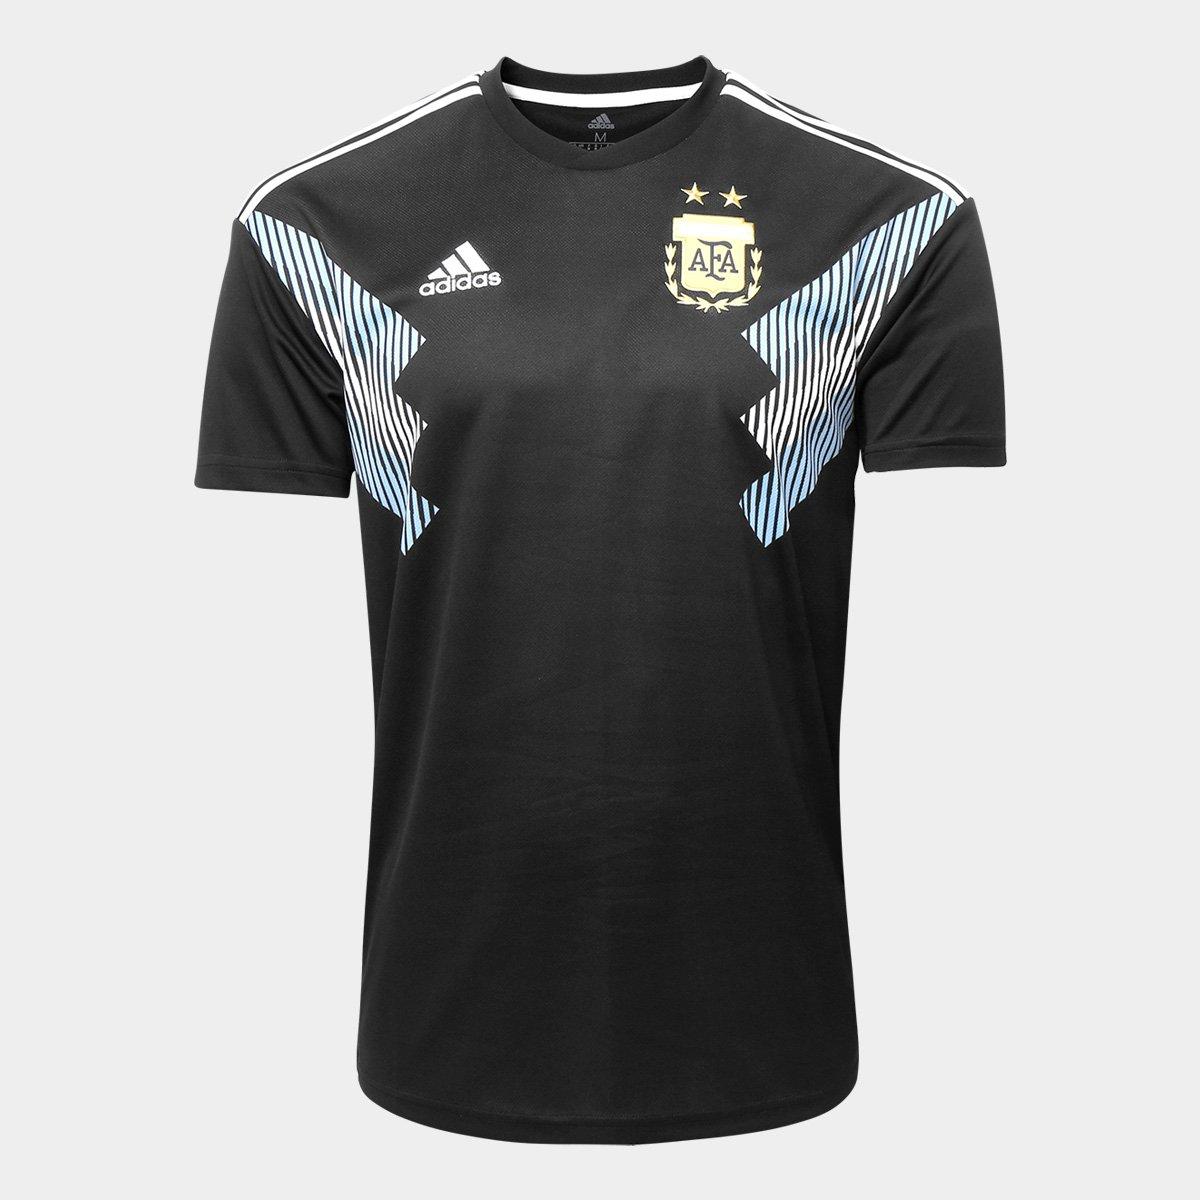 ... Camisa Seleção Argentina Away 2018 n° 21 Dybala - Torcedor Adidas  Masculina ... a102fb5176e46